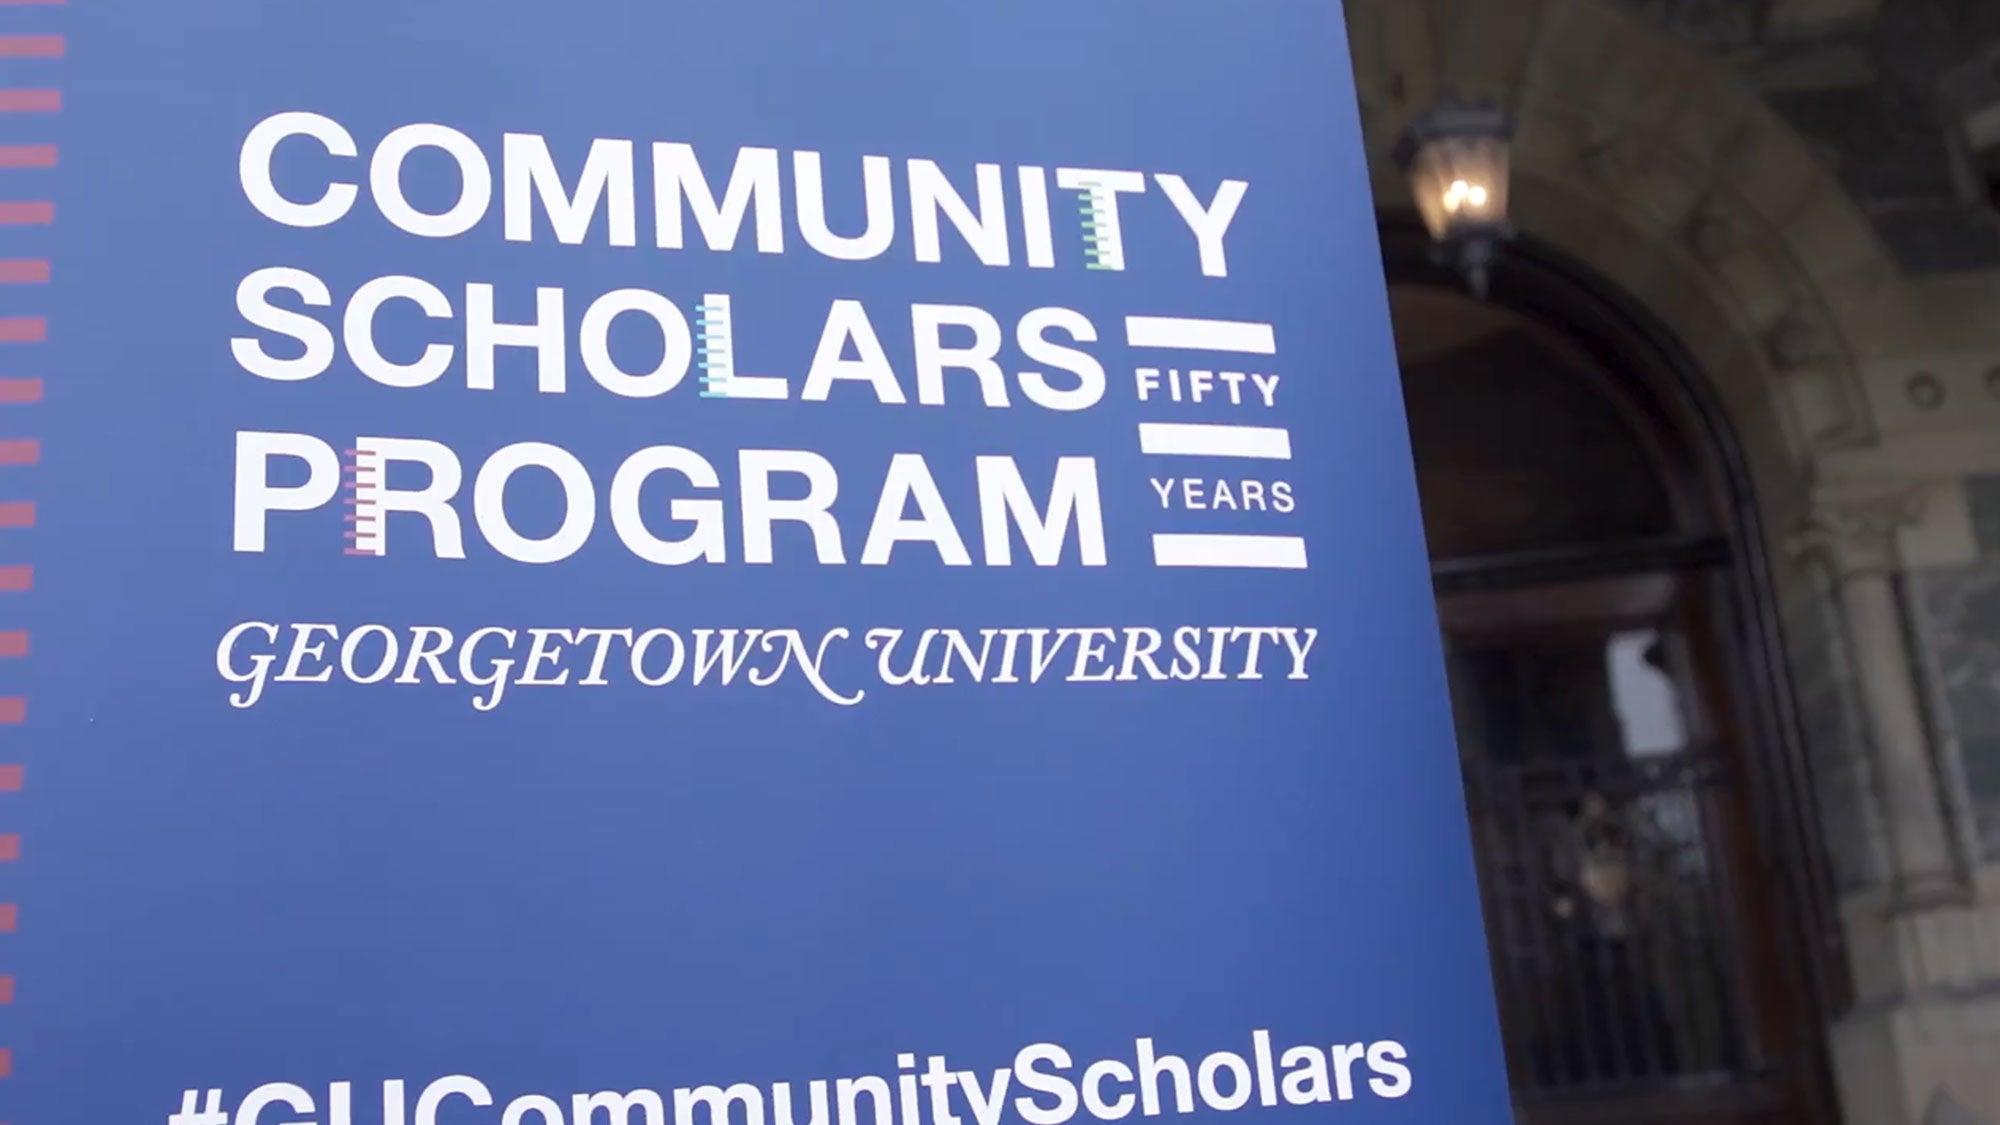 Community Scholars Program signage